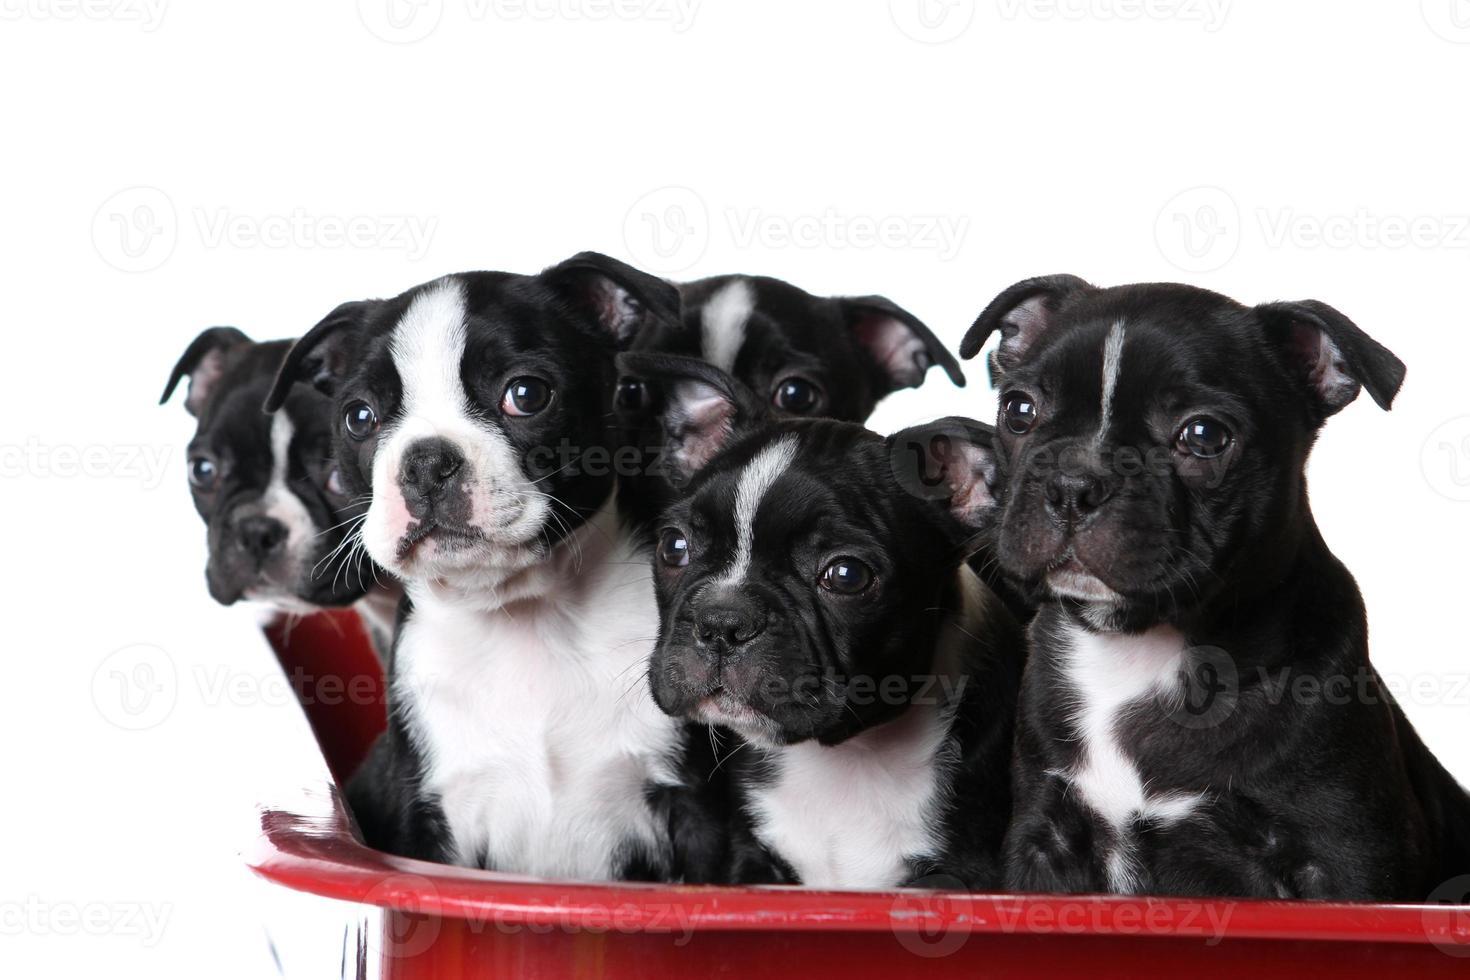 Alert Boston Terrier Puppies photo